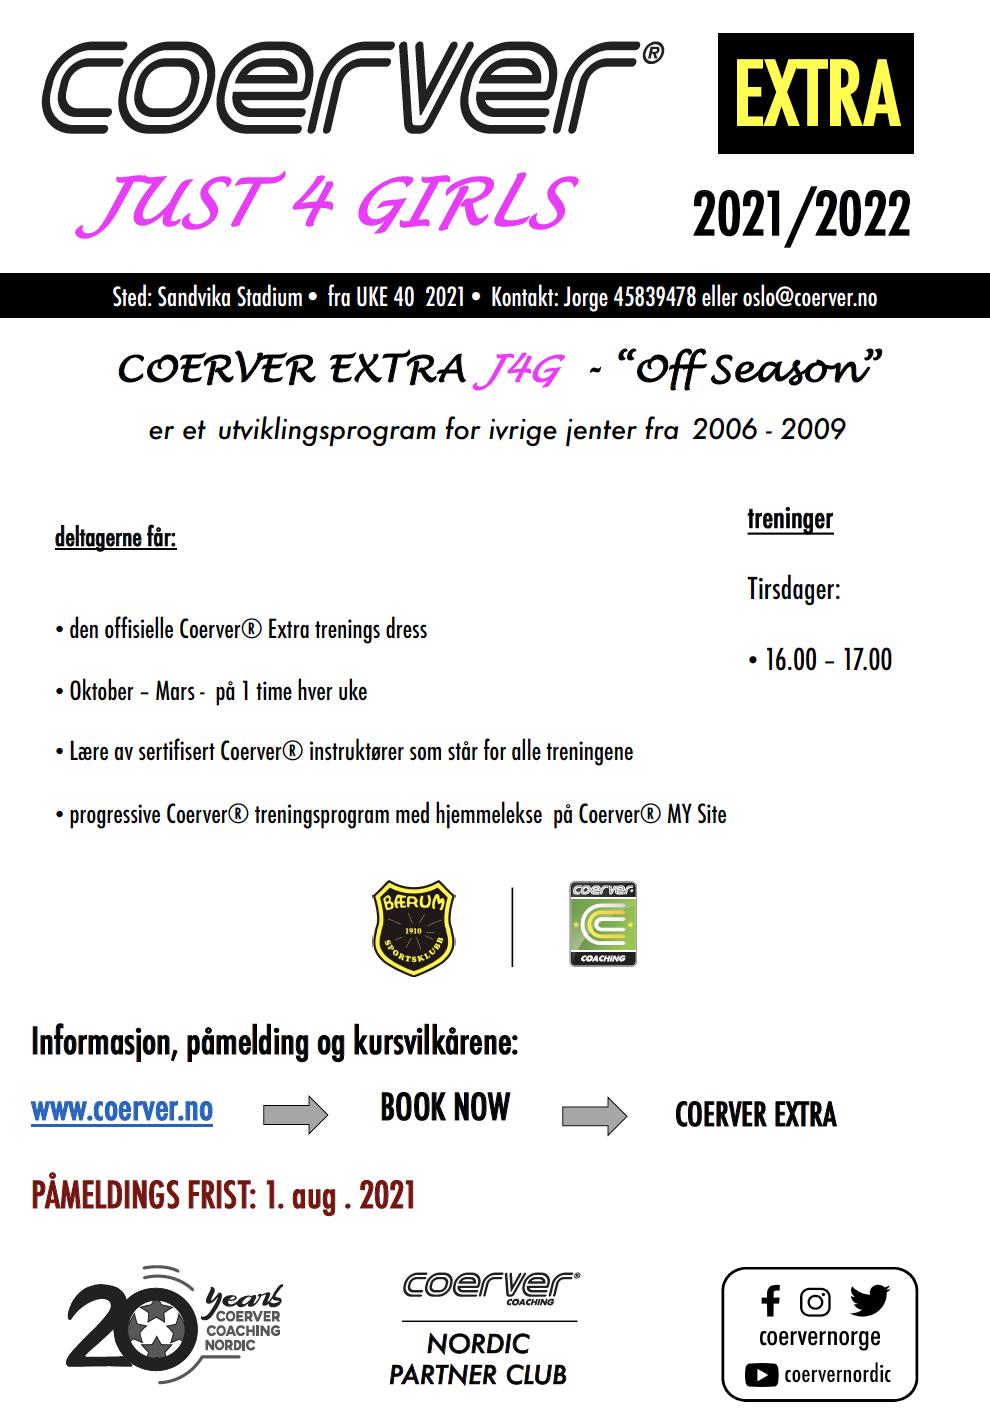 Coerver Extra Bærum SK Just4Girls (Off Season)